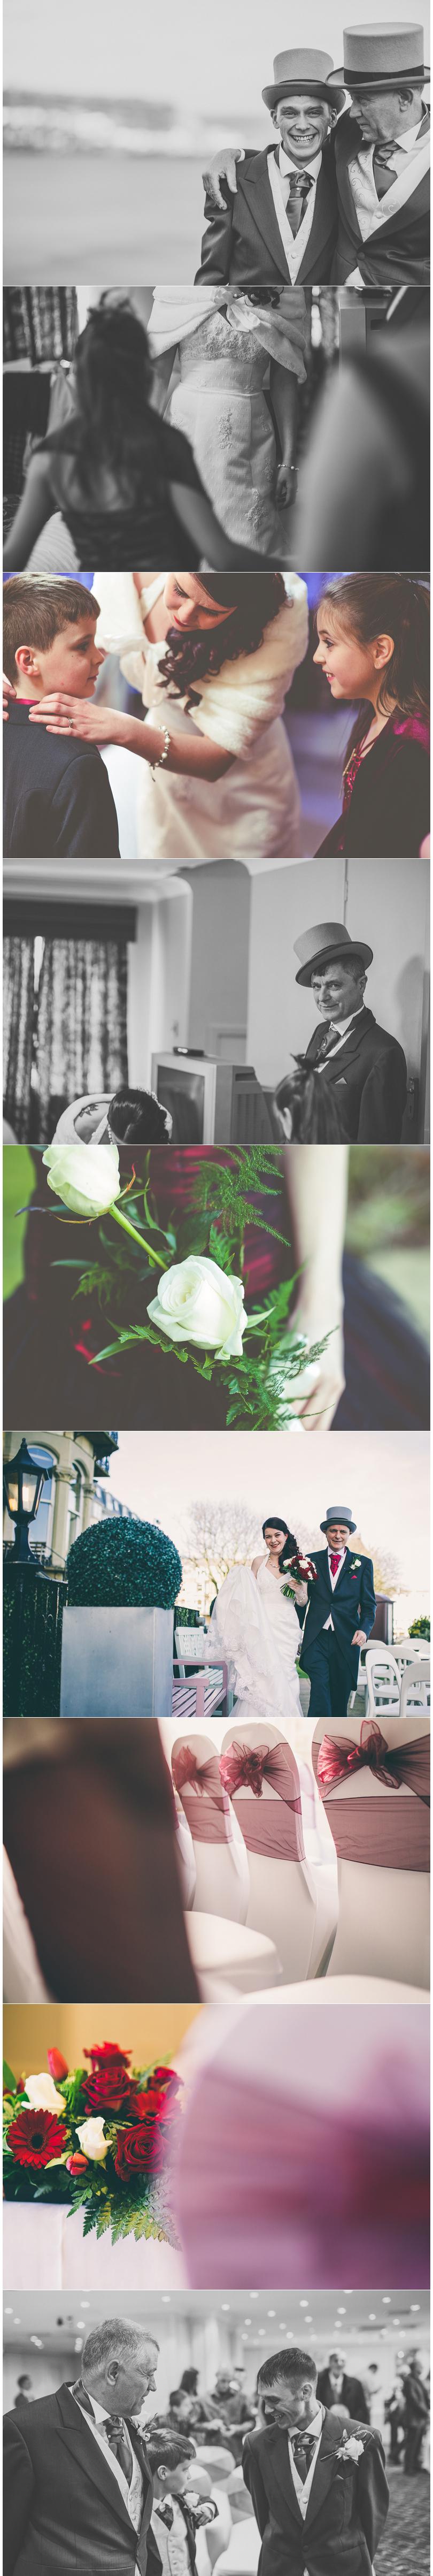 Neil_Jackson_Photographic_Scarborough_York_Yorkshire_Wedding_Photographer_Jo_Ash_Ambassador_Spa_Hotel_Scarborough_Wedding_Blog3